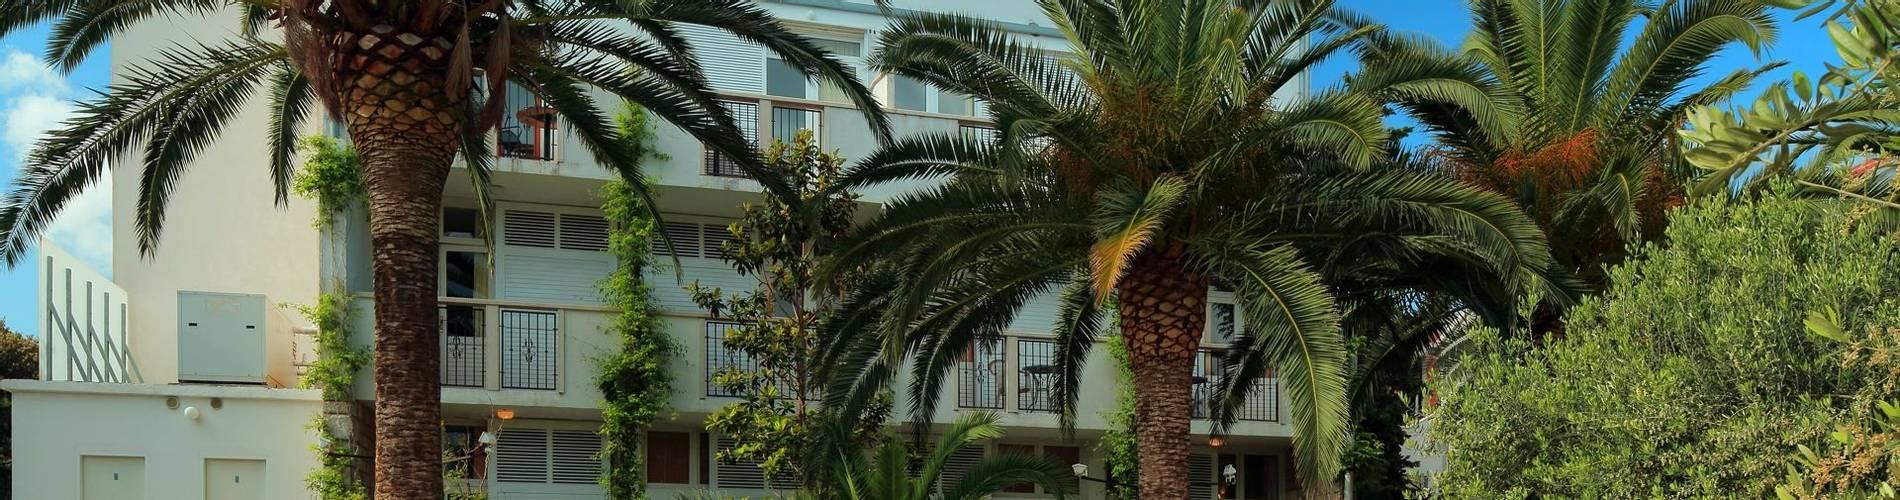 Hotel Villa ADRIATICA 2014 ZFacade 4X6 Garden2 21MB.jpg